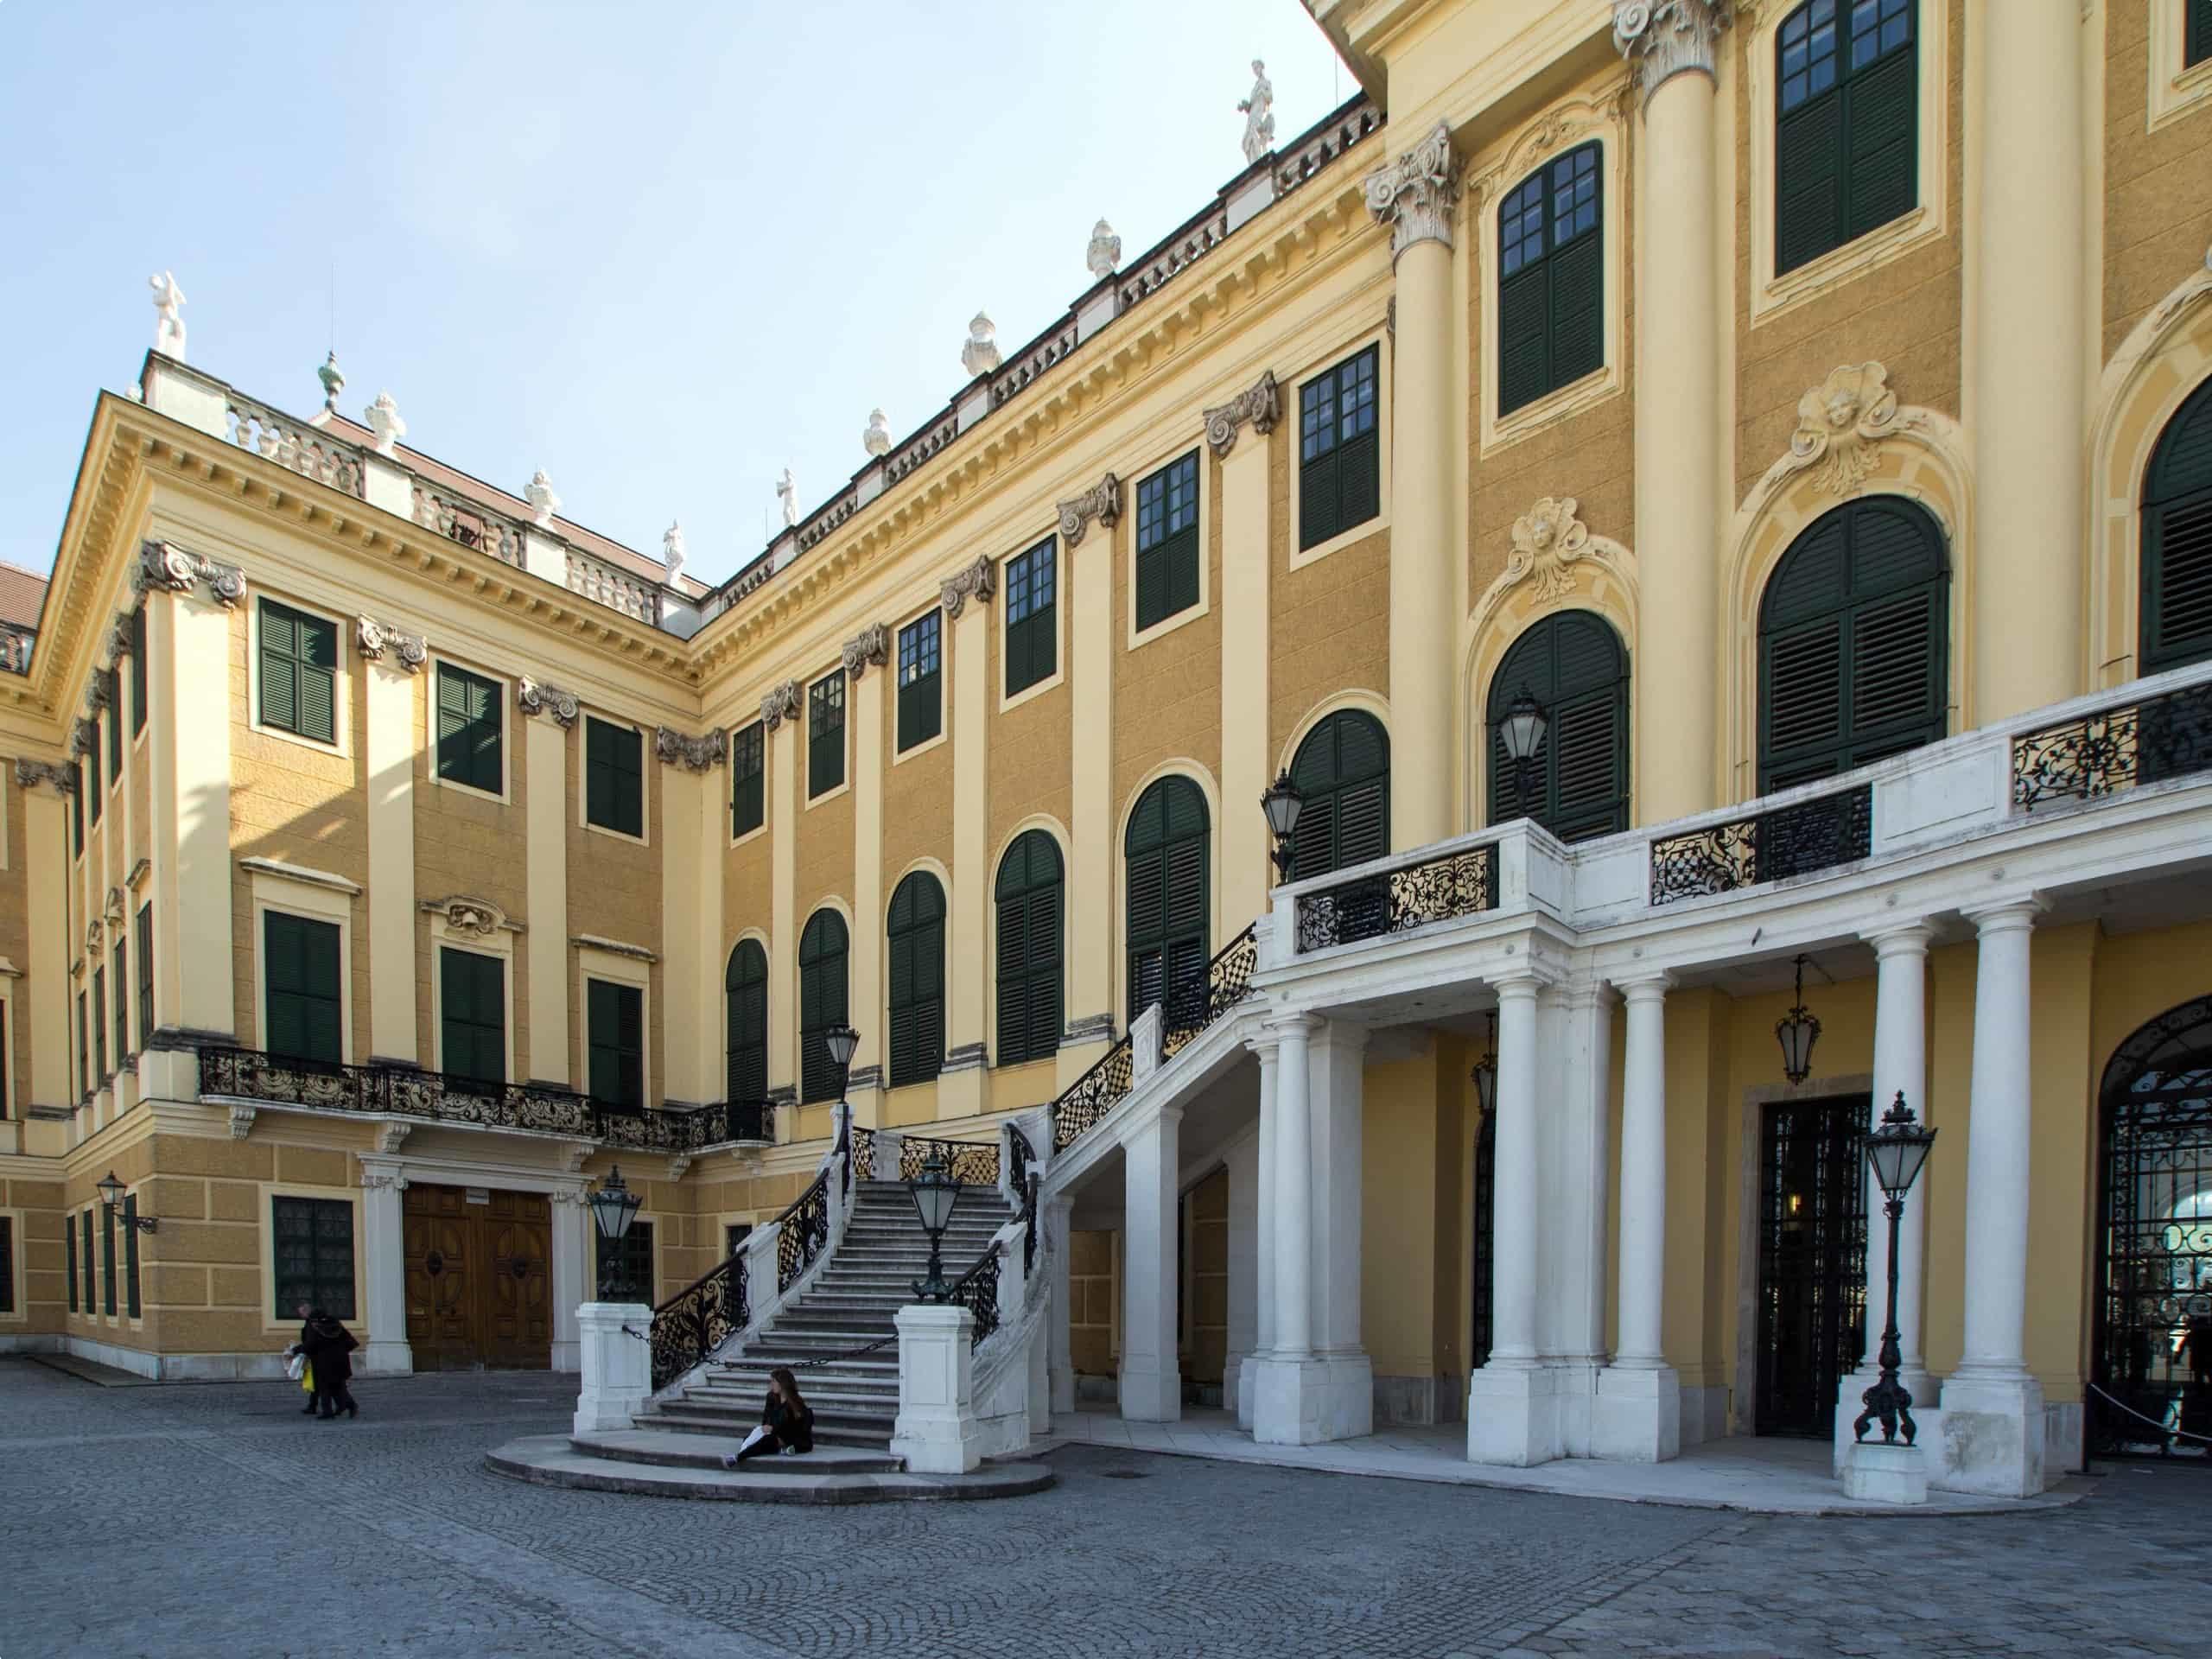 A close-up of the palace near the main entrance